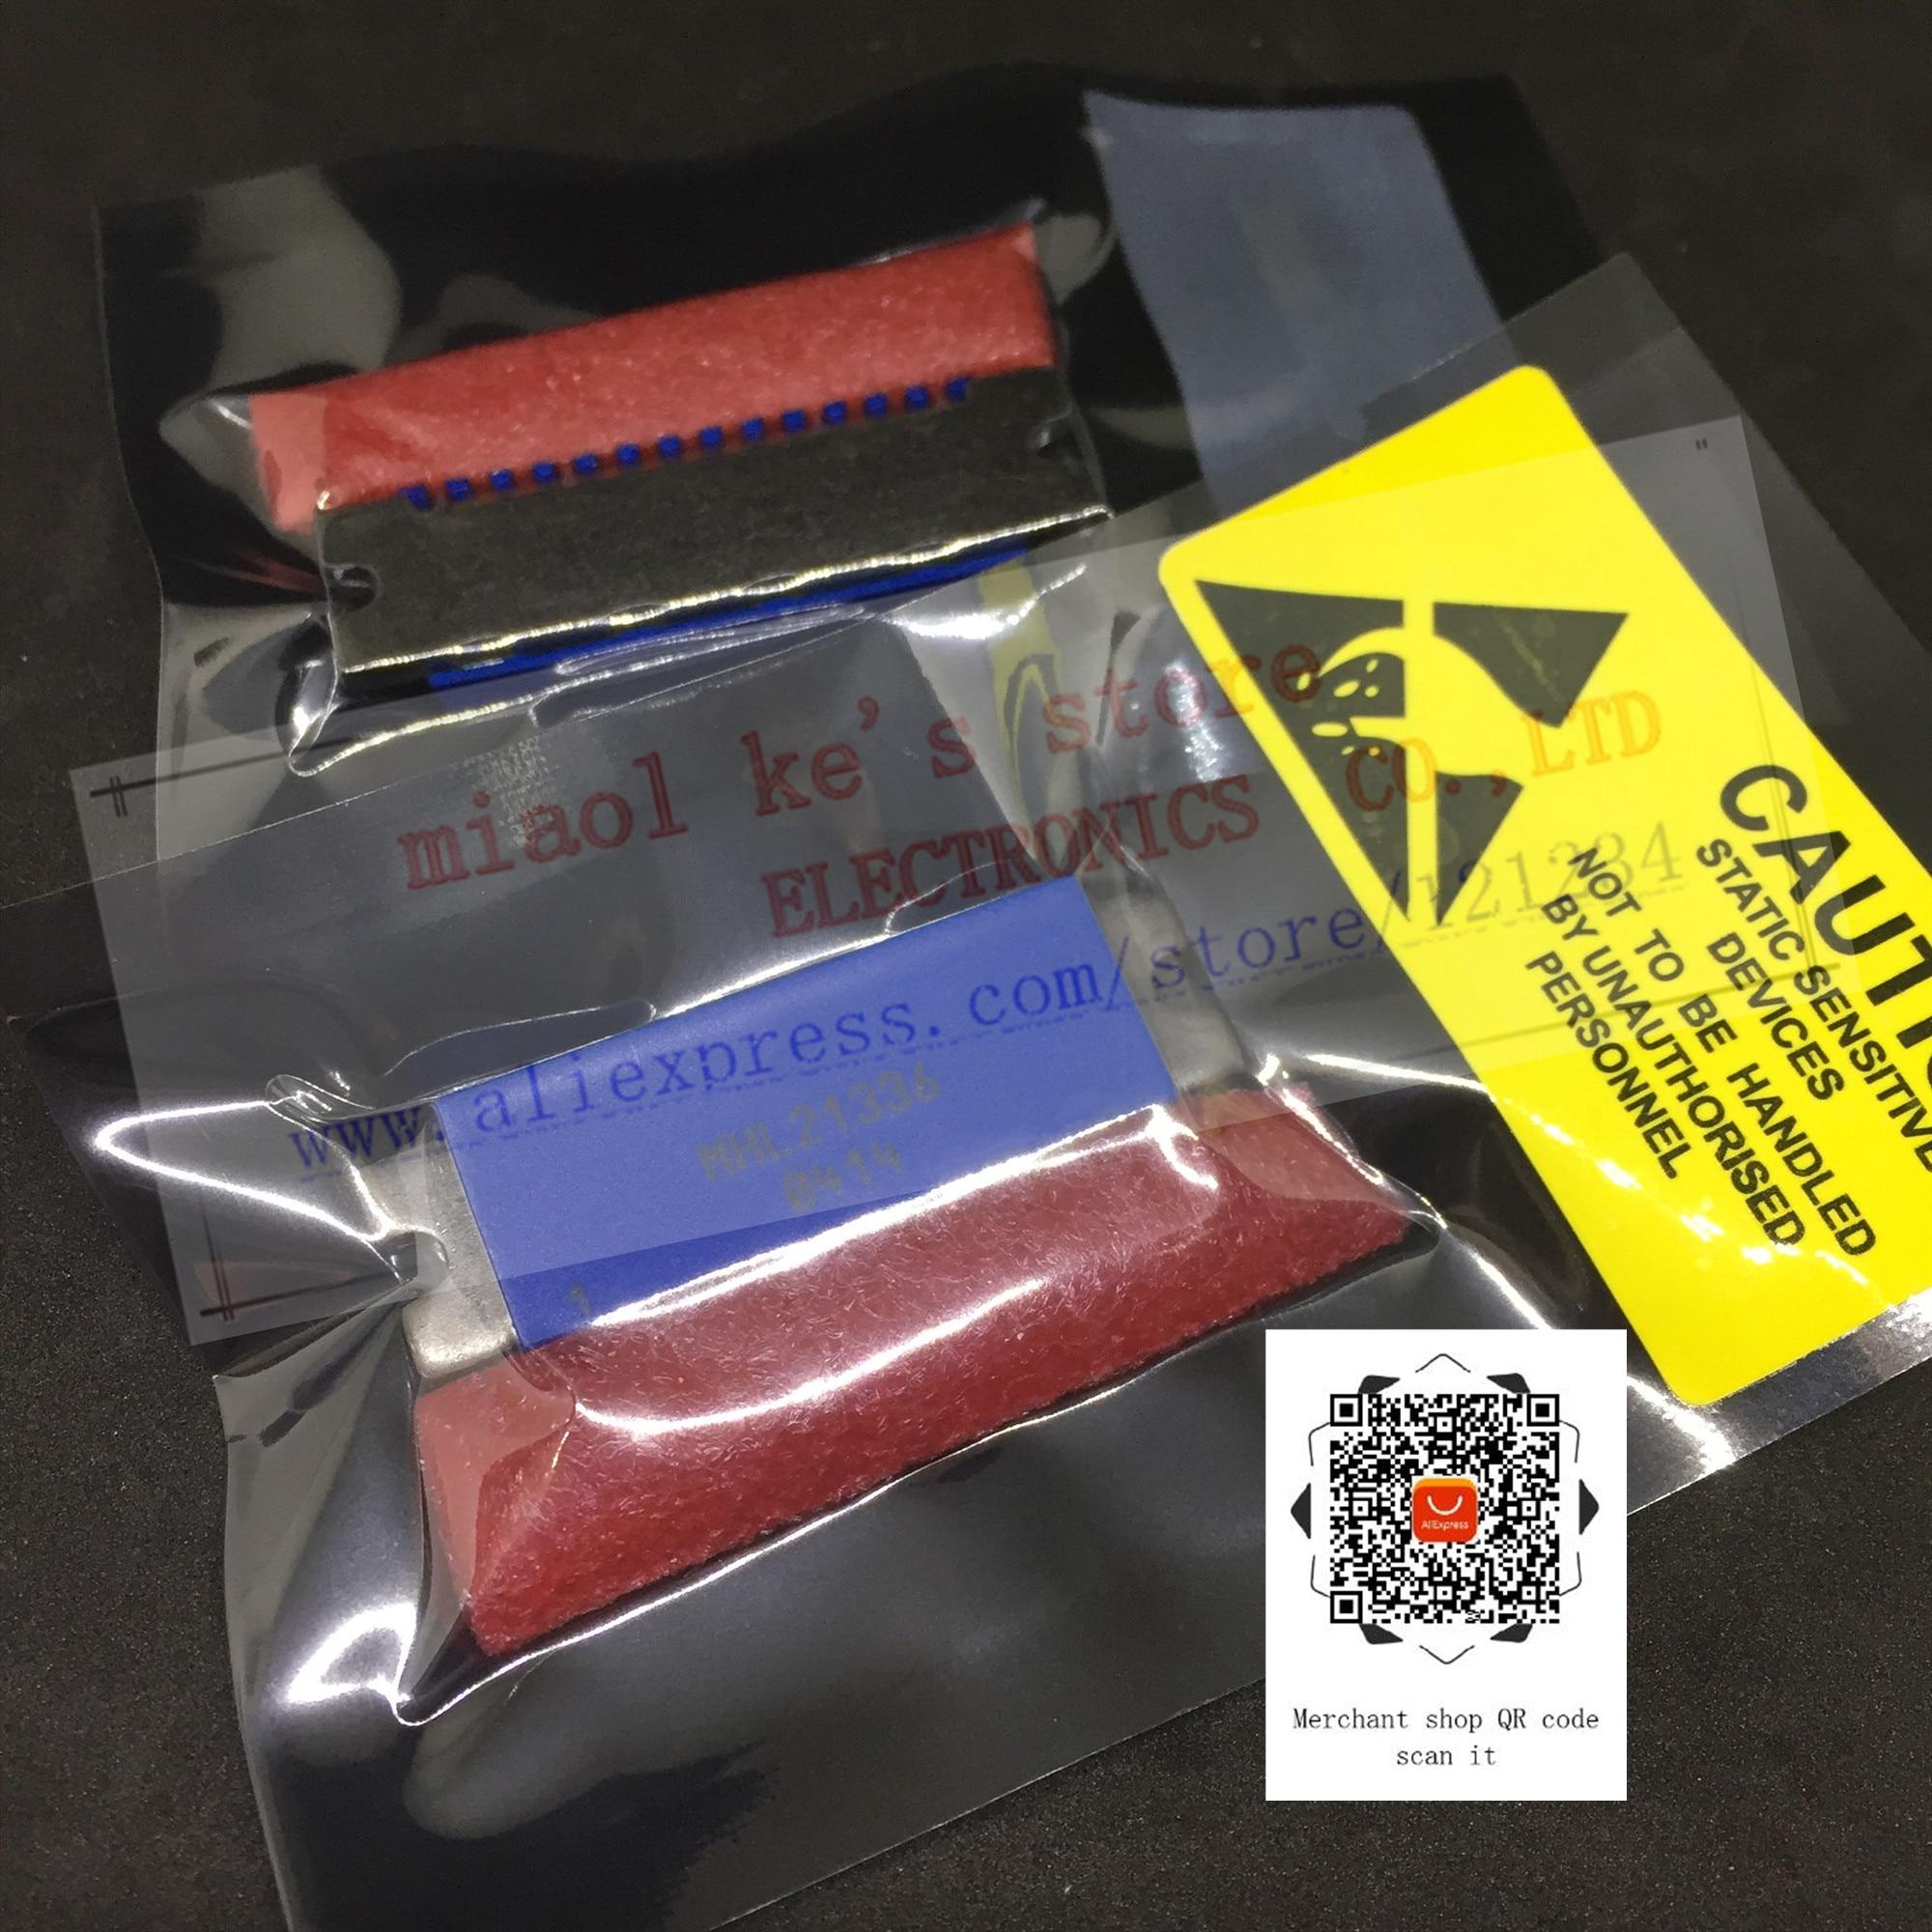 100%original; MHL21336 mhl21336 [ 2110-2170MHz  3.0W 31dB CASE 301AP–02 ] - 3G BAND RF LINEAR LDMOS AMPLIFIER